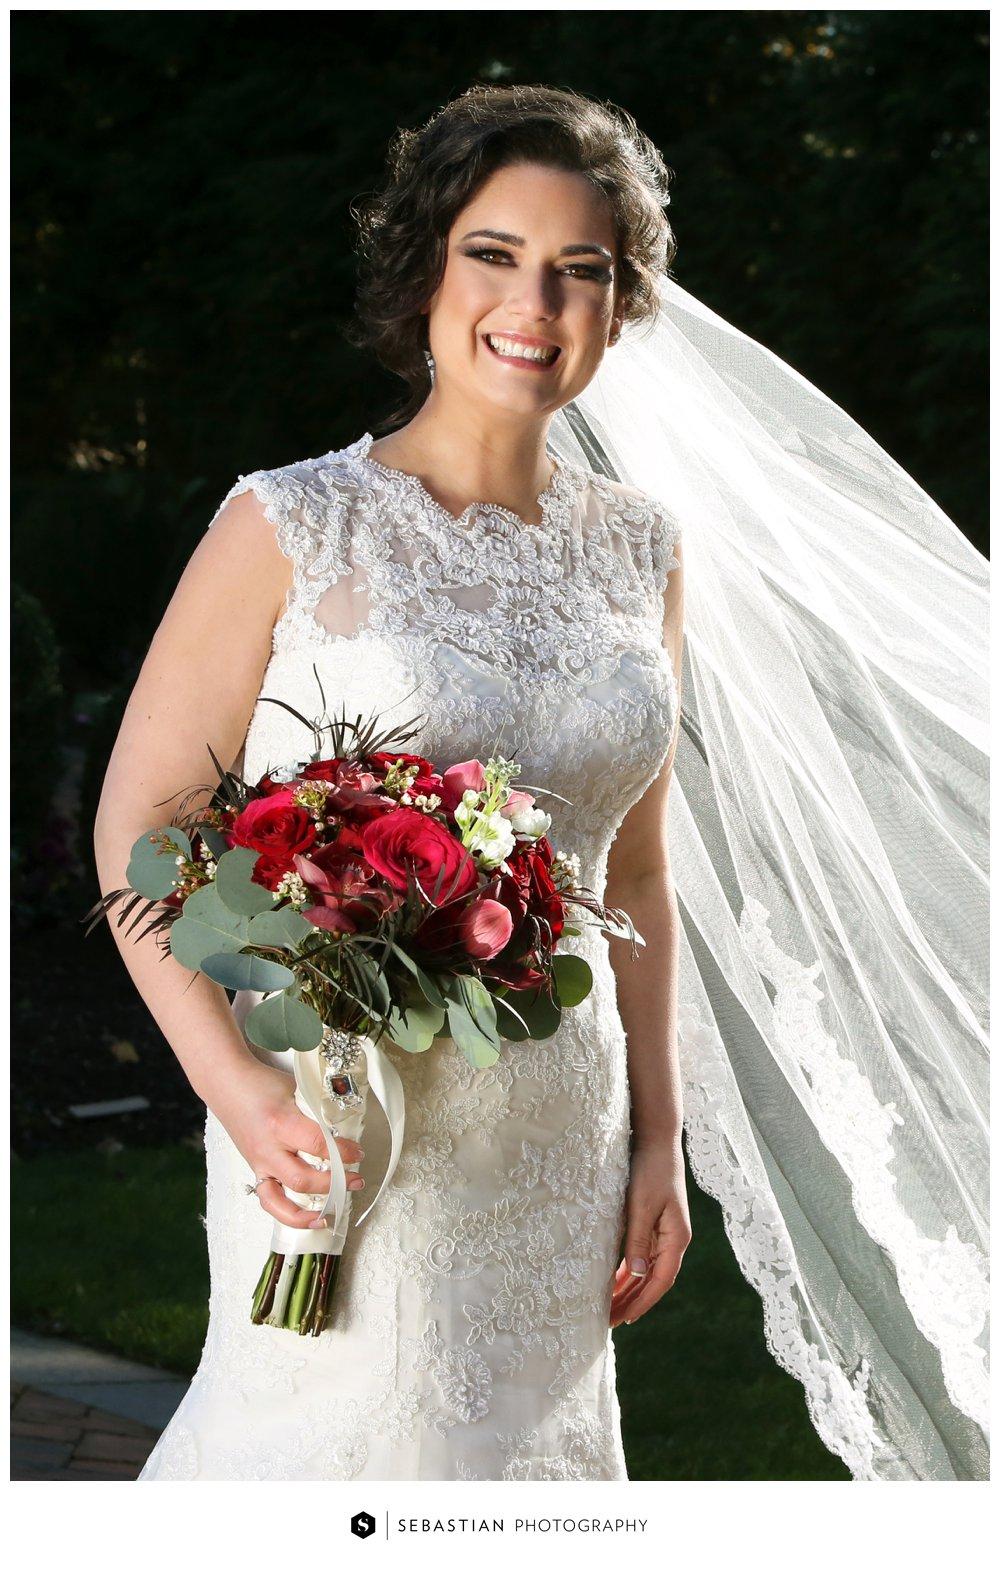 Sebastian Photography_NJ Wedding_NJWedding Photographer_Fall Wedding_The Estate at Florentine Gardens_7027.jpg